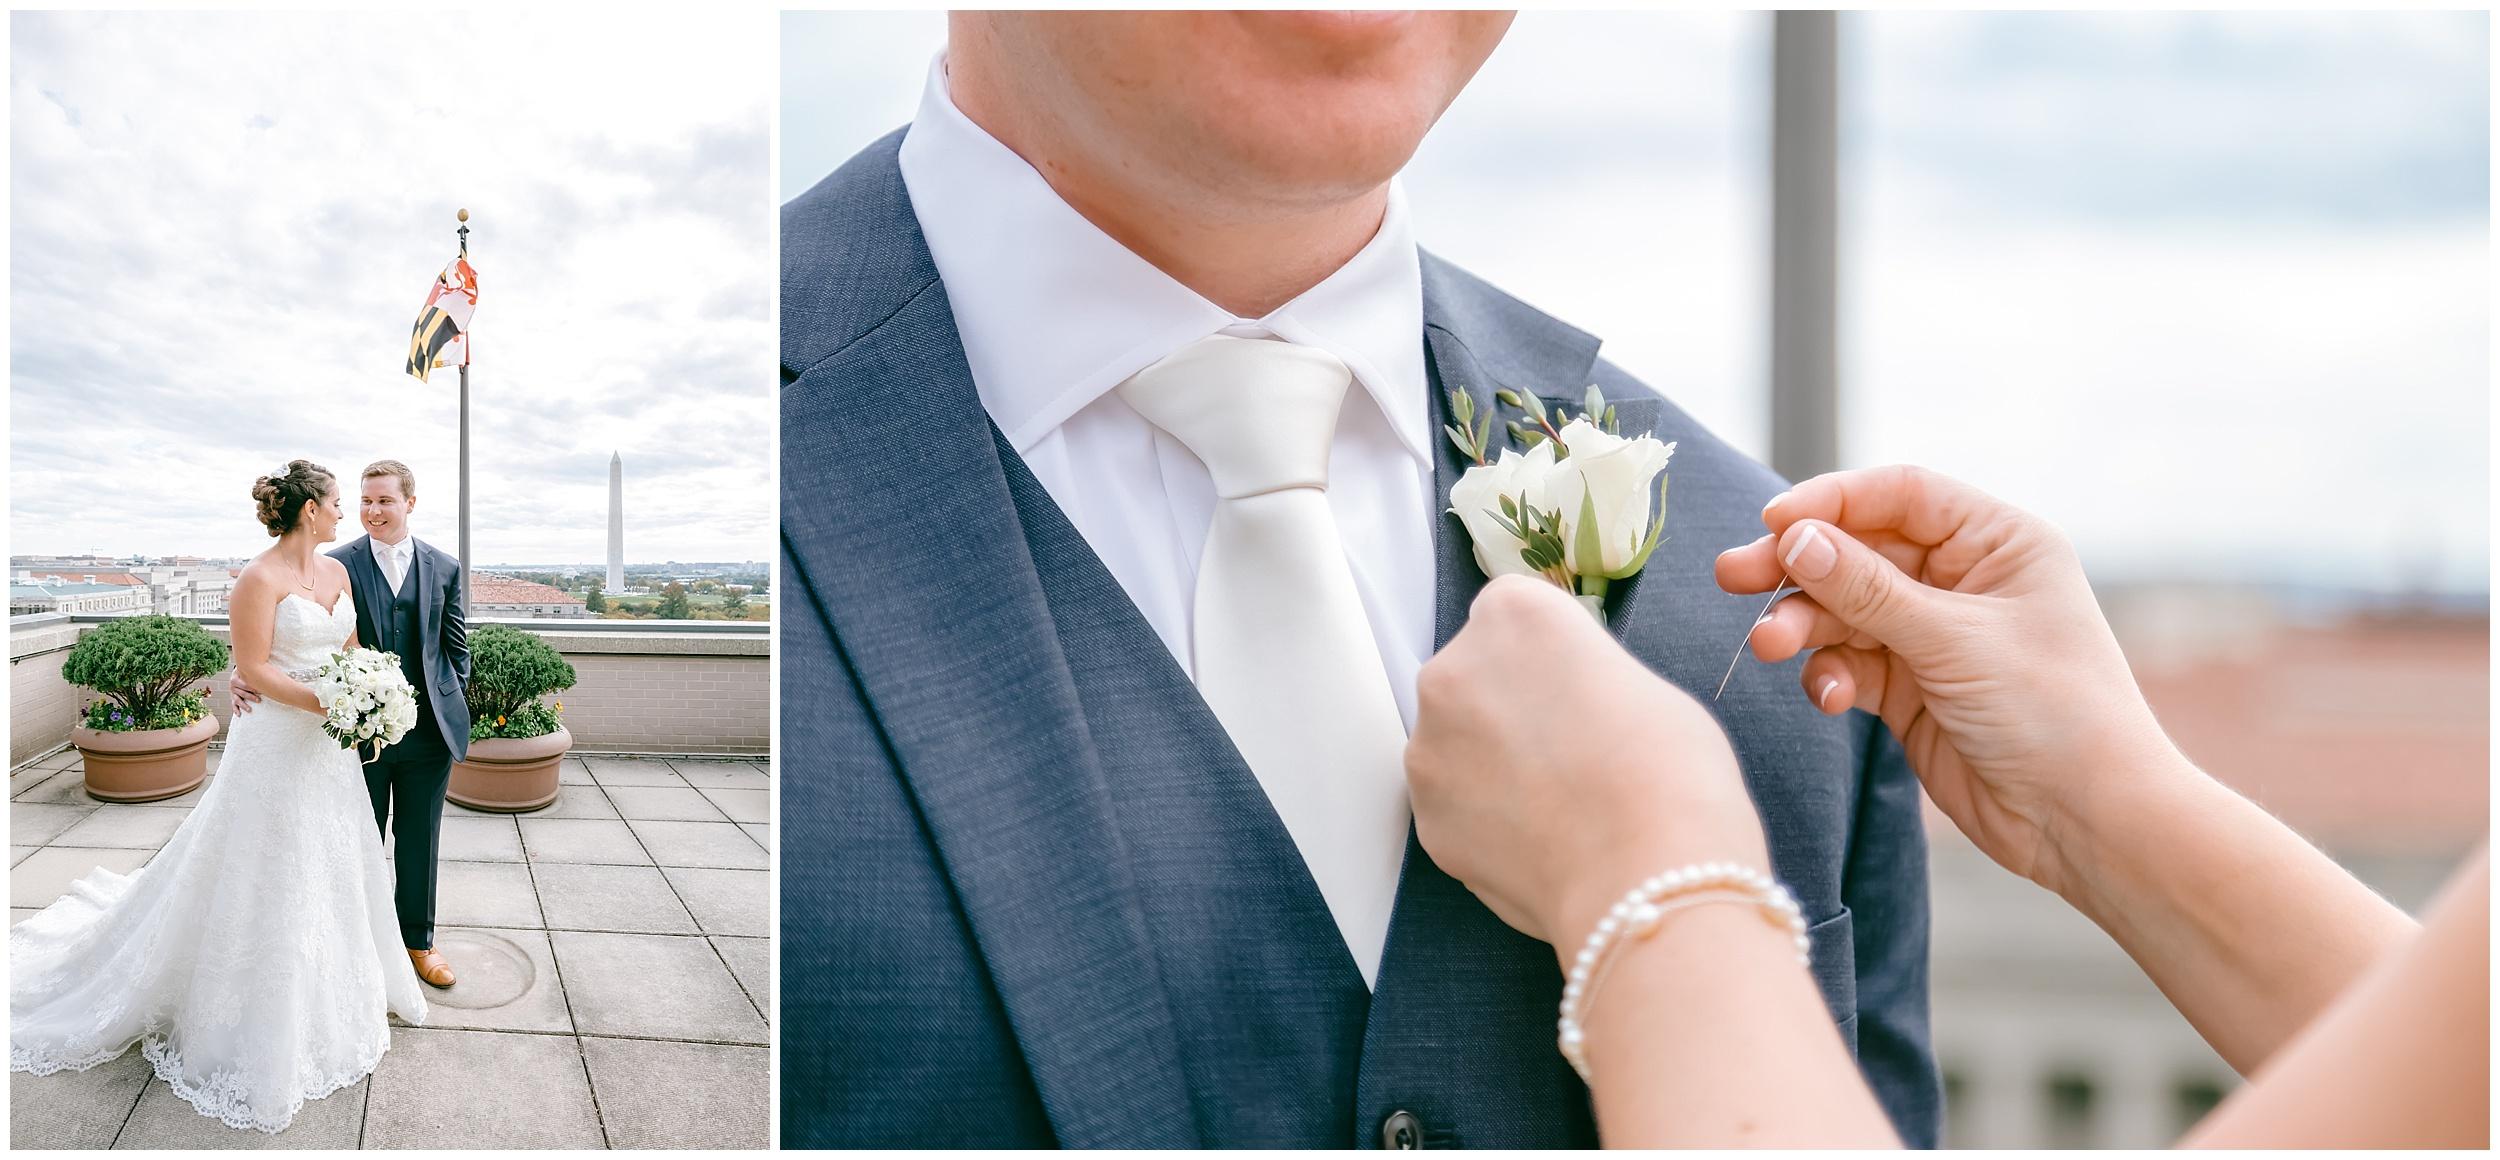 wedding-bride-groom-portrait-rooftop-willard-hotel-washington-monument-washington-dc-photographer